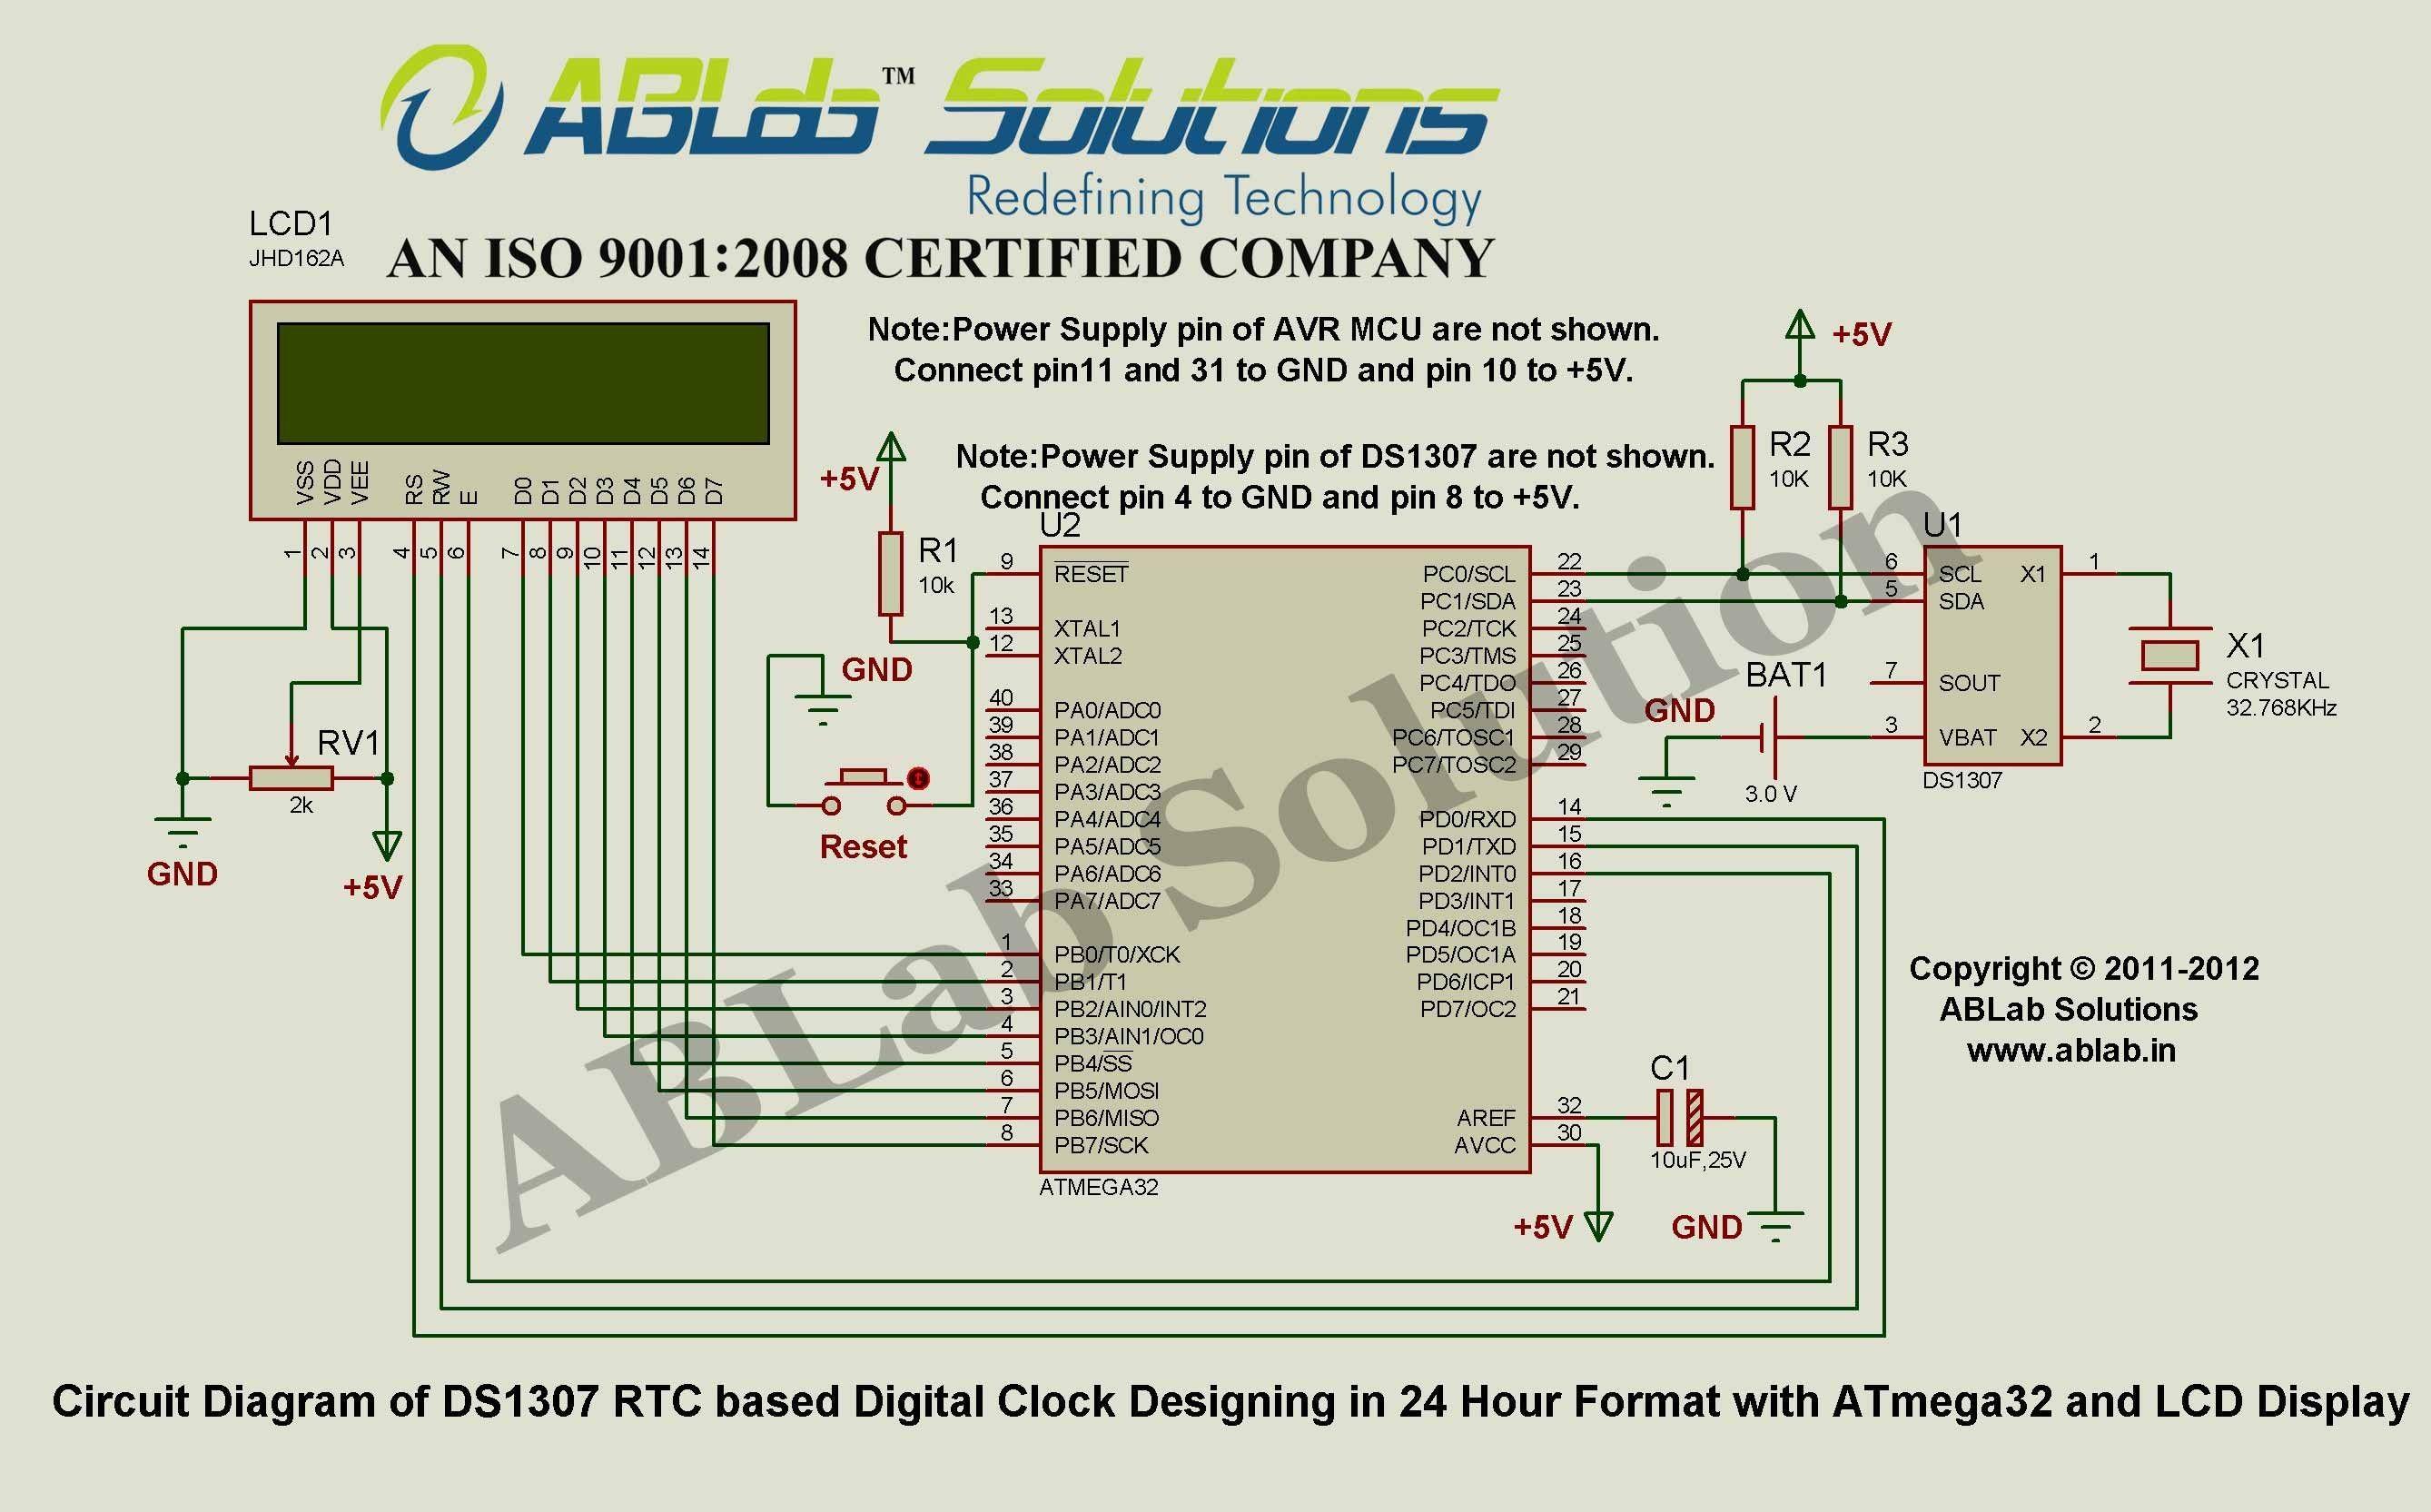 Engineering Block Diagram Ds1307 Rtc Based Digital Clock Designing In 24 Hour format with Avr Of Engineering Block Diagram